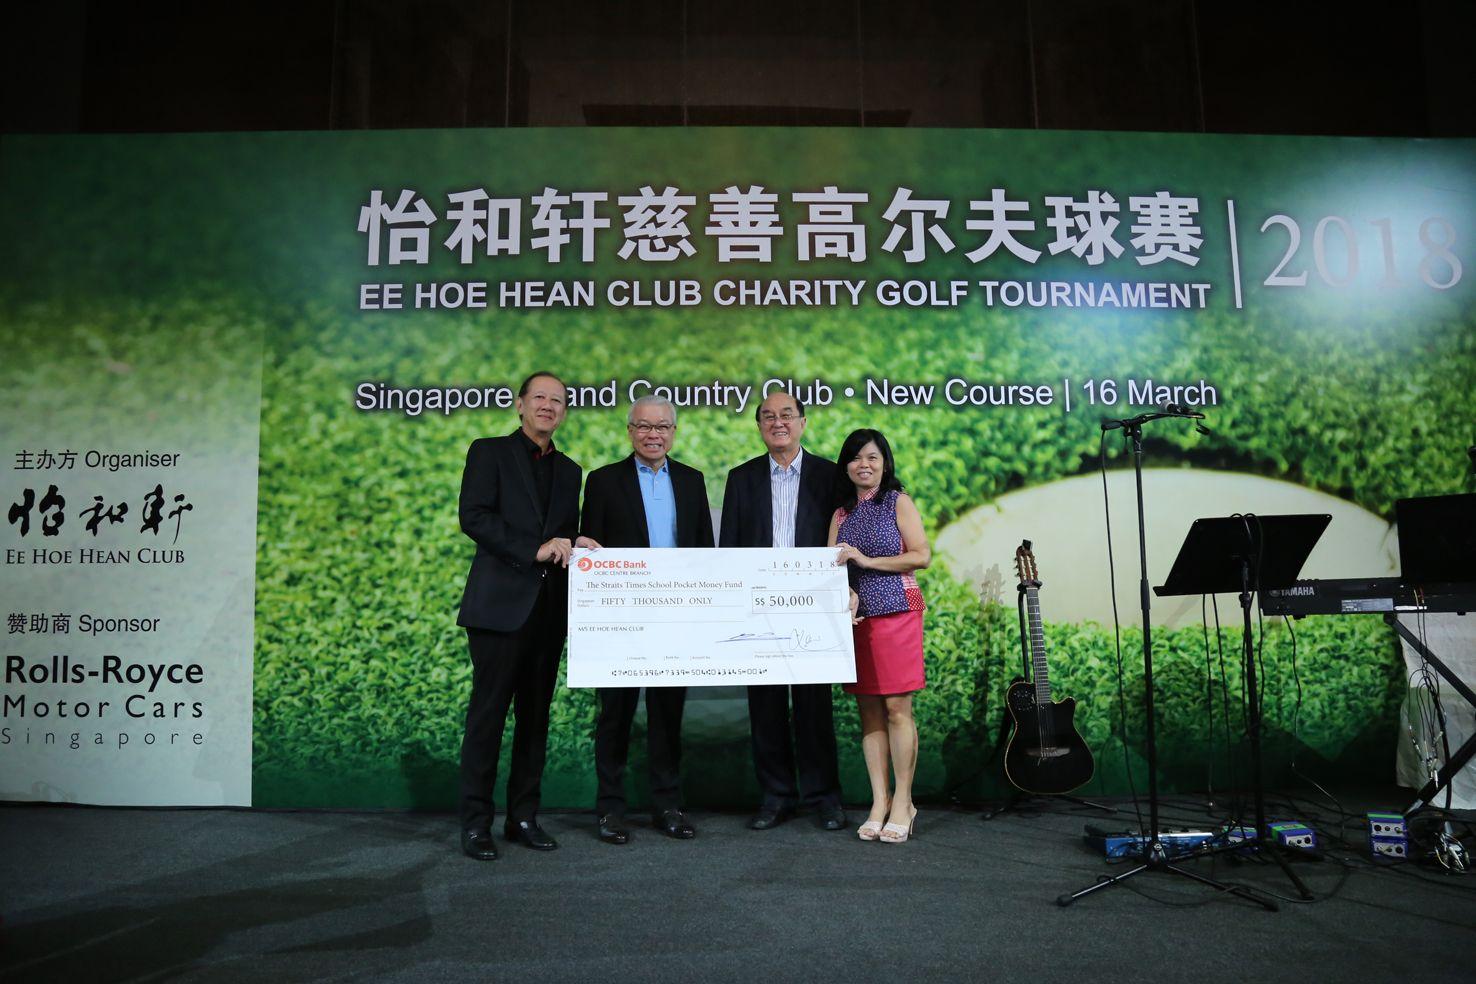 Francis Ko, Chua Thian Poh, Karsono Kwee, Tan Bee Heong